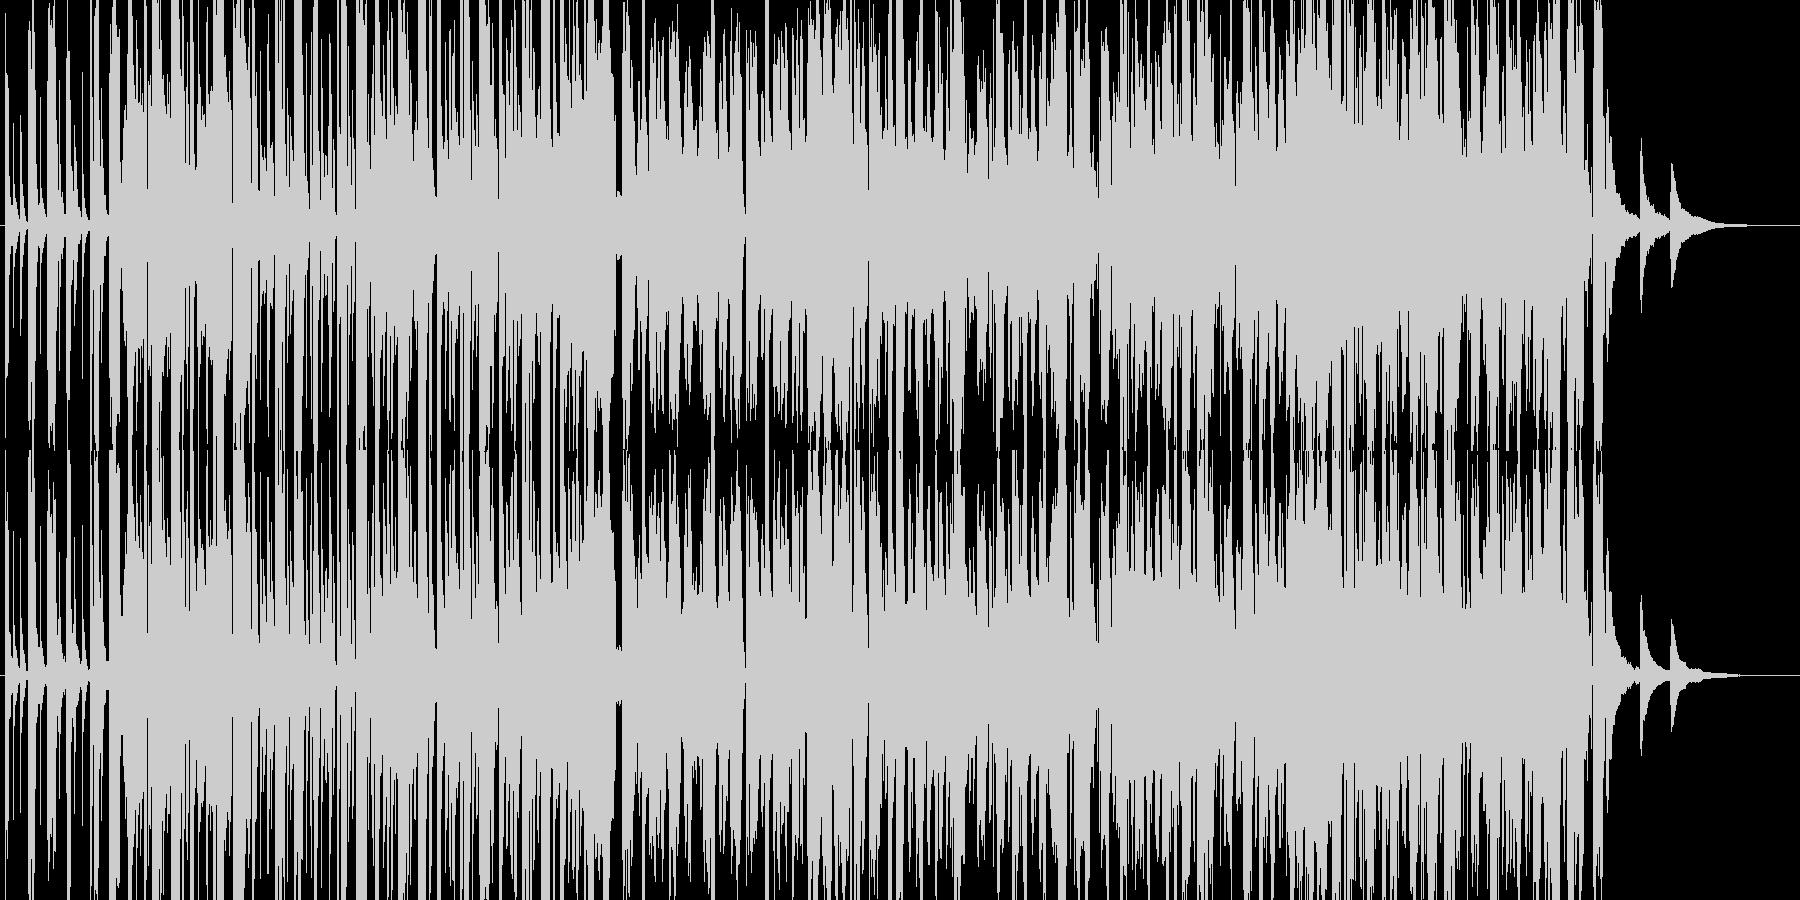 kawaii pop おしゃれで可愛い曲の未再生の波形